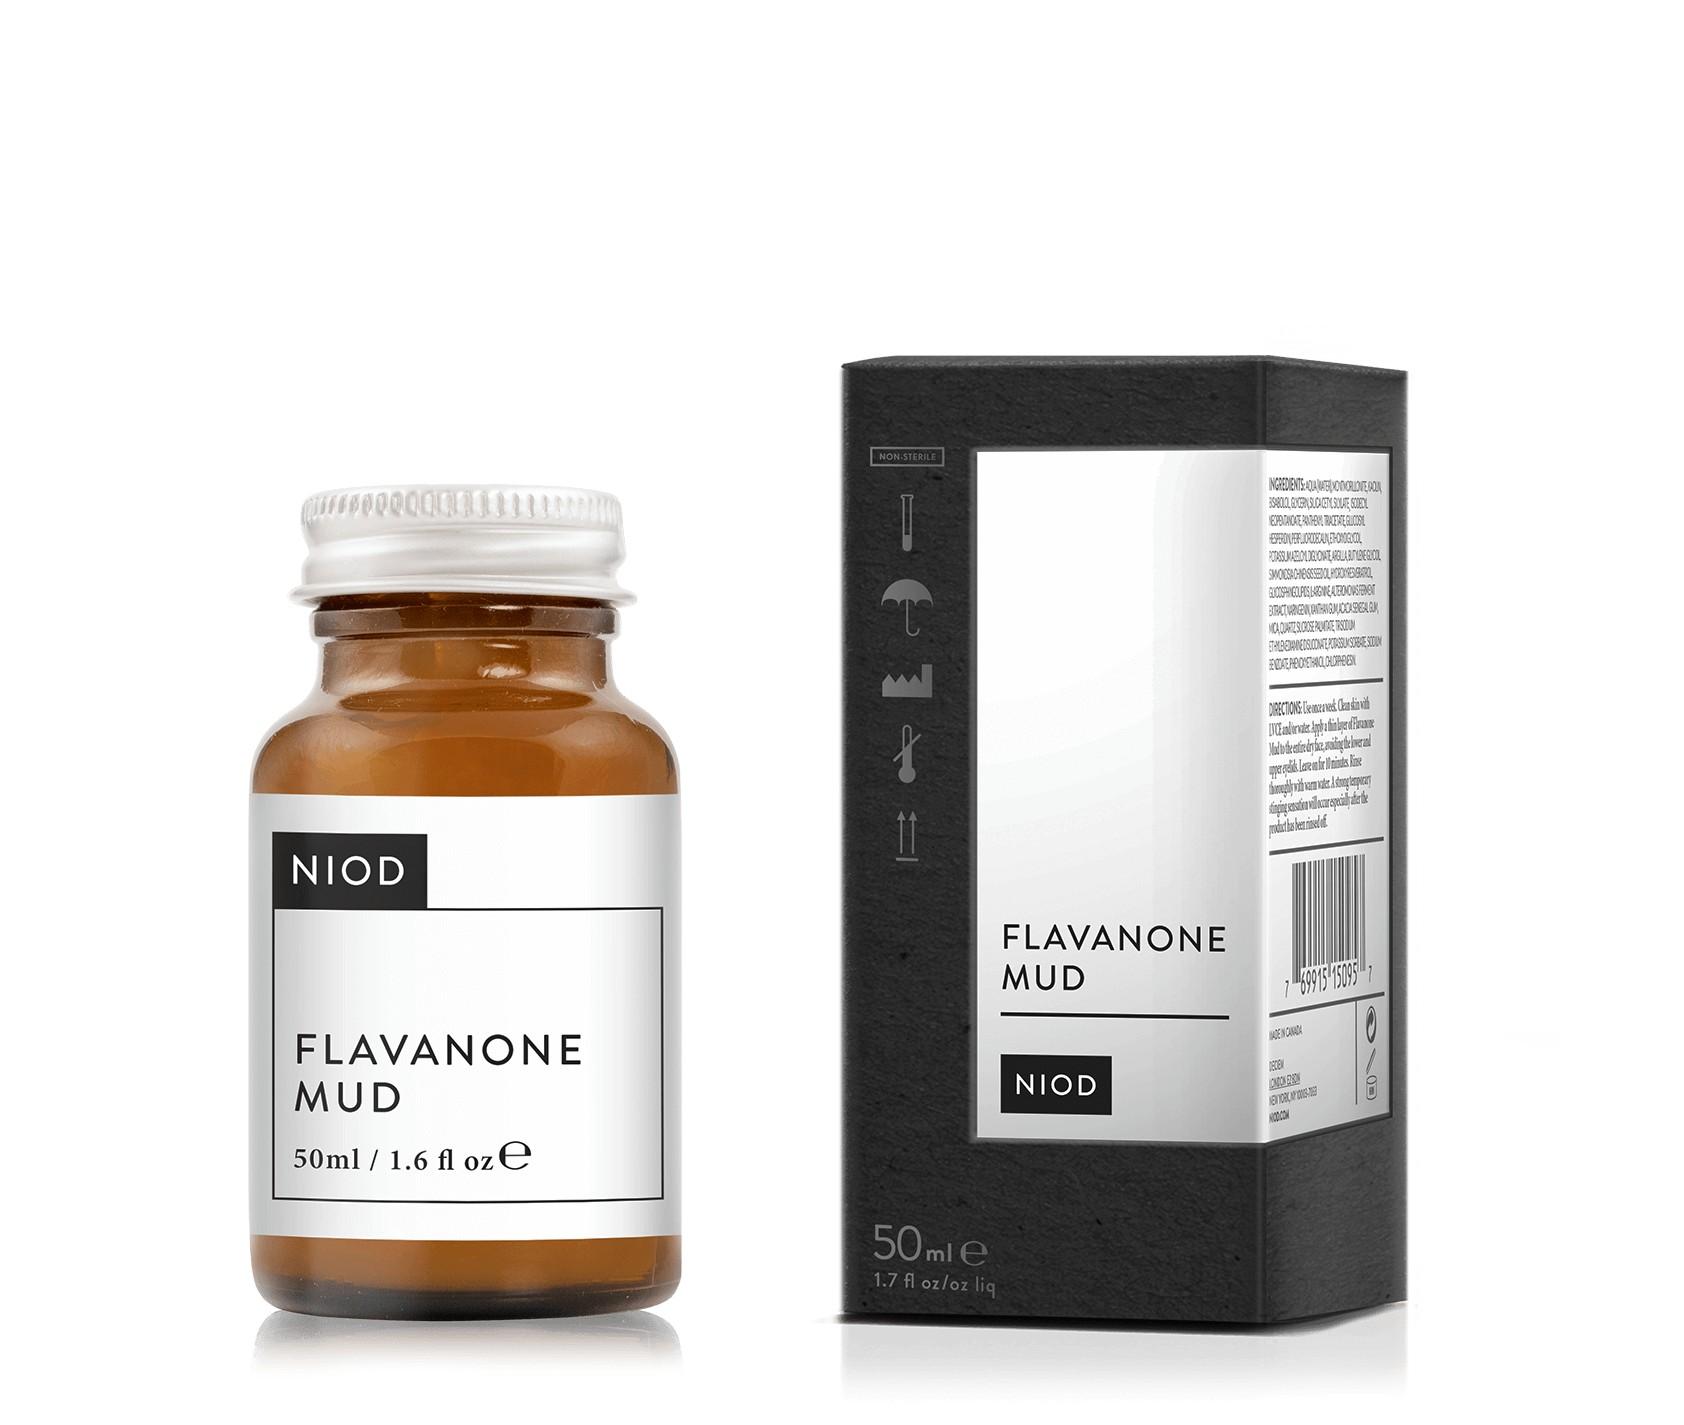 Flavanone Mud - NIOD